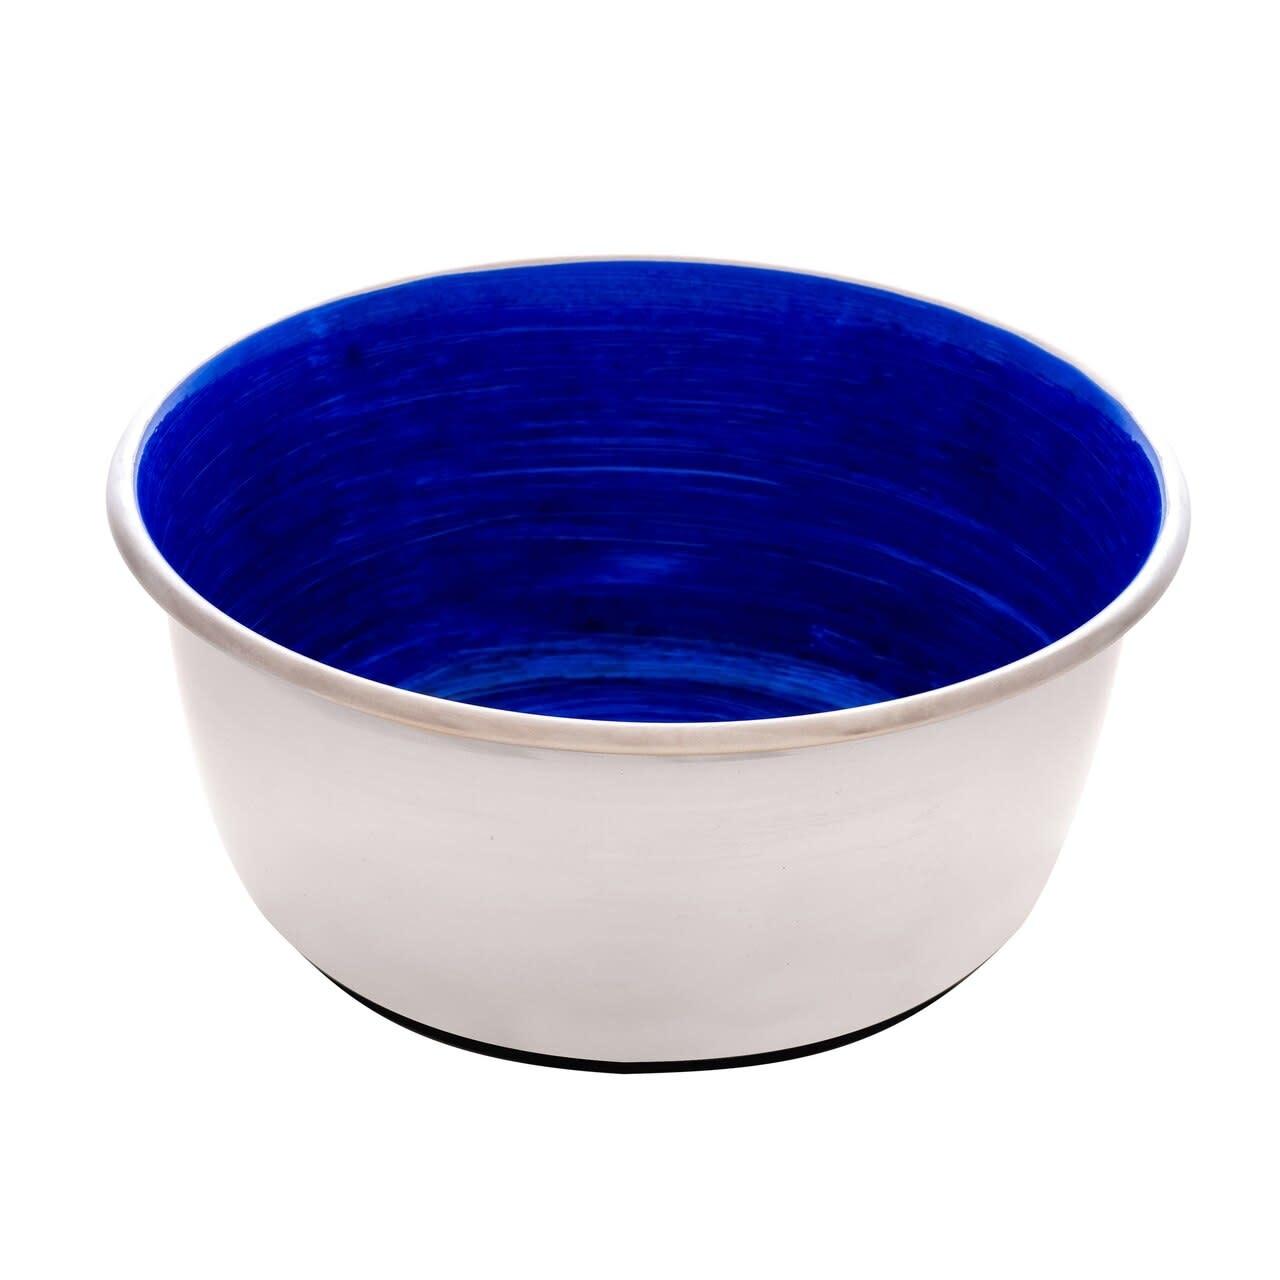 Dogit S/Steel Blue Swirl Bowl 32 fl.oz